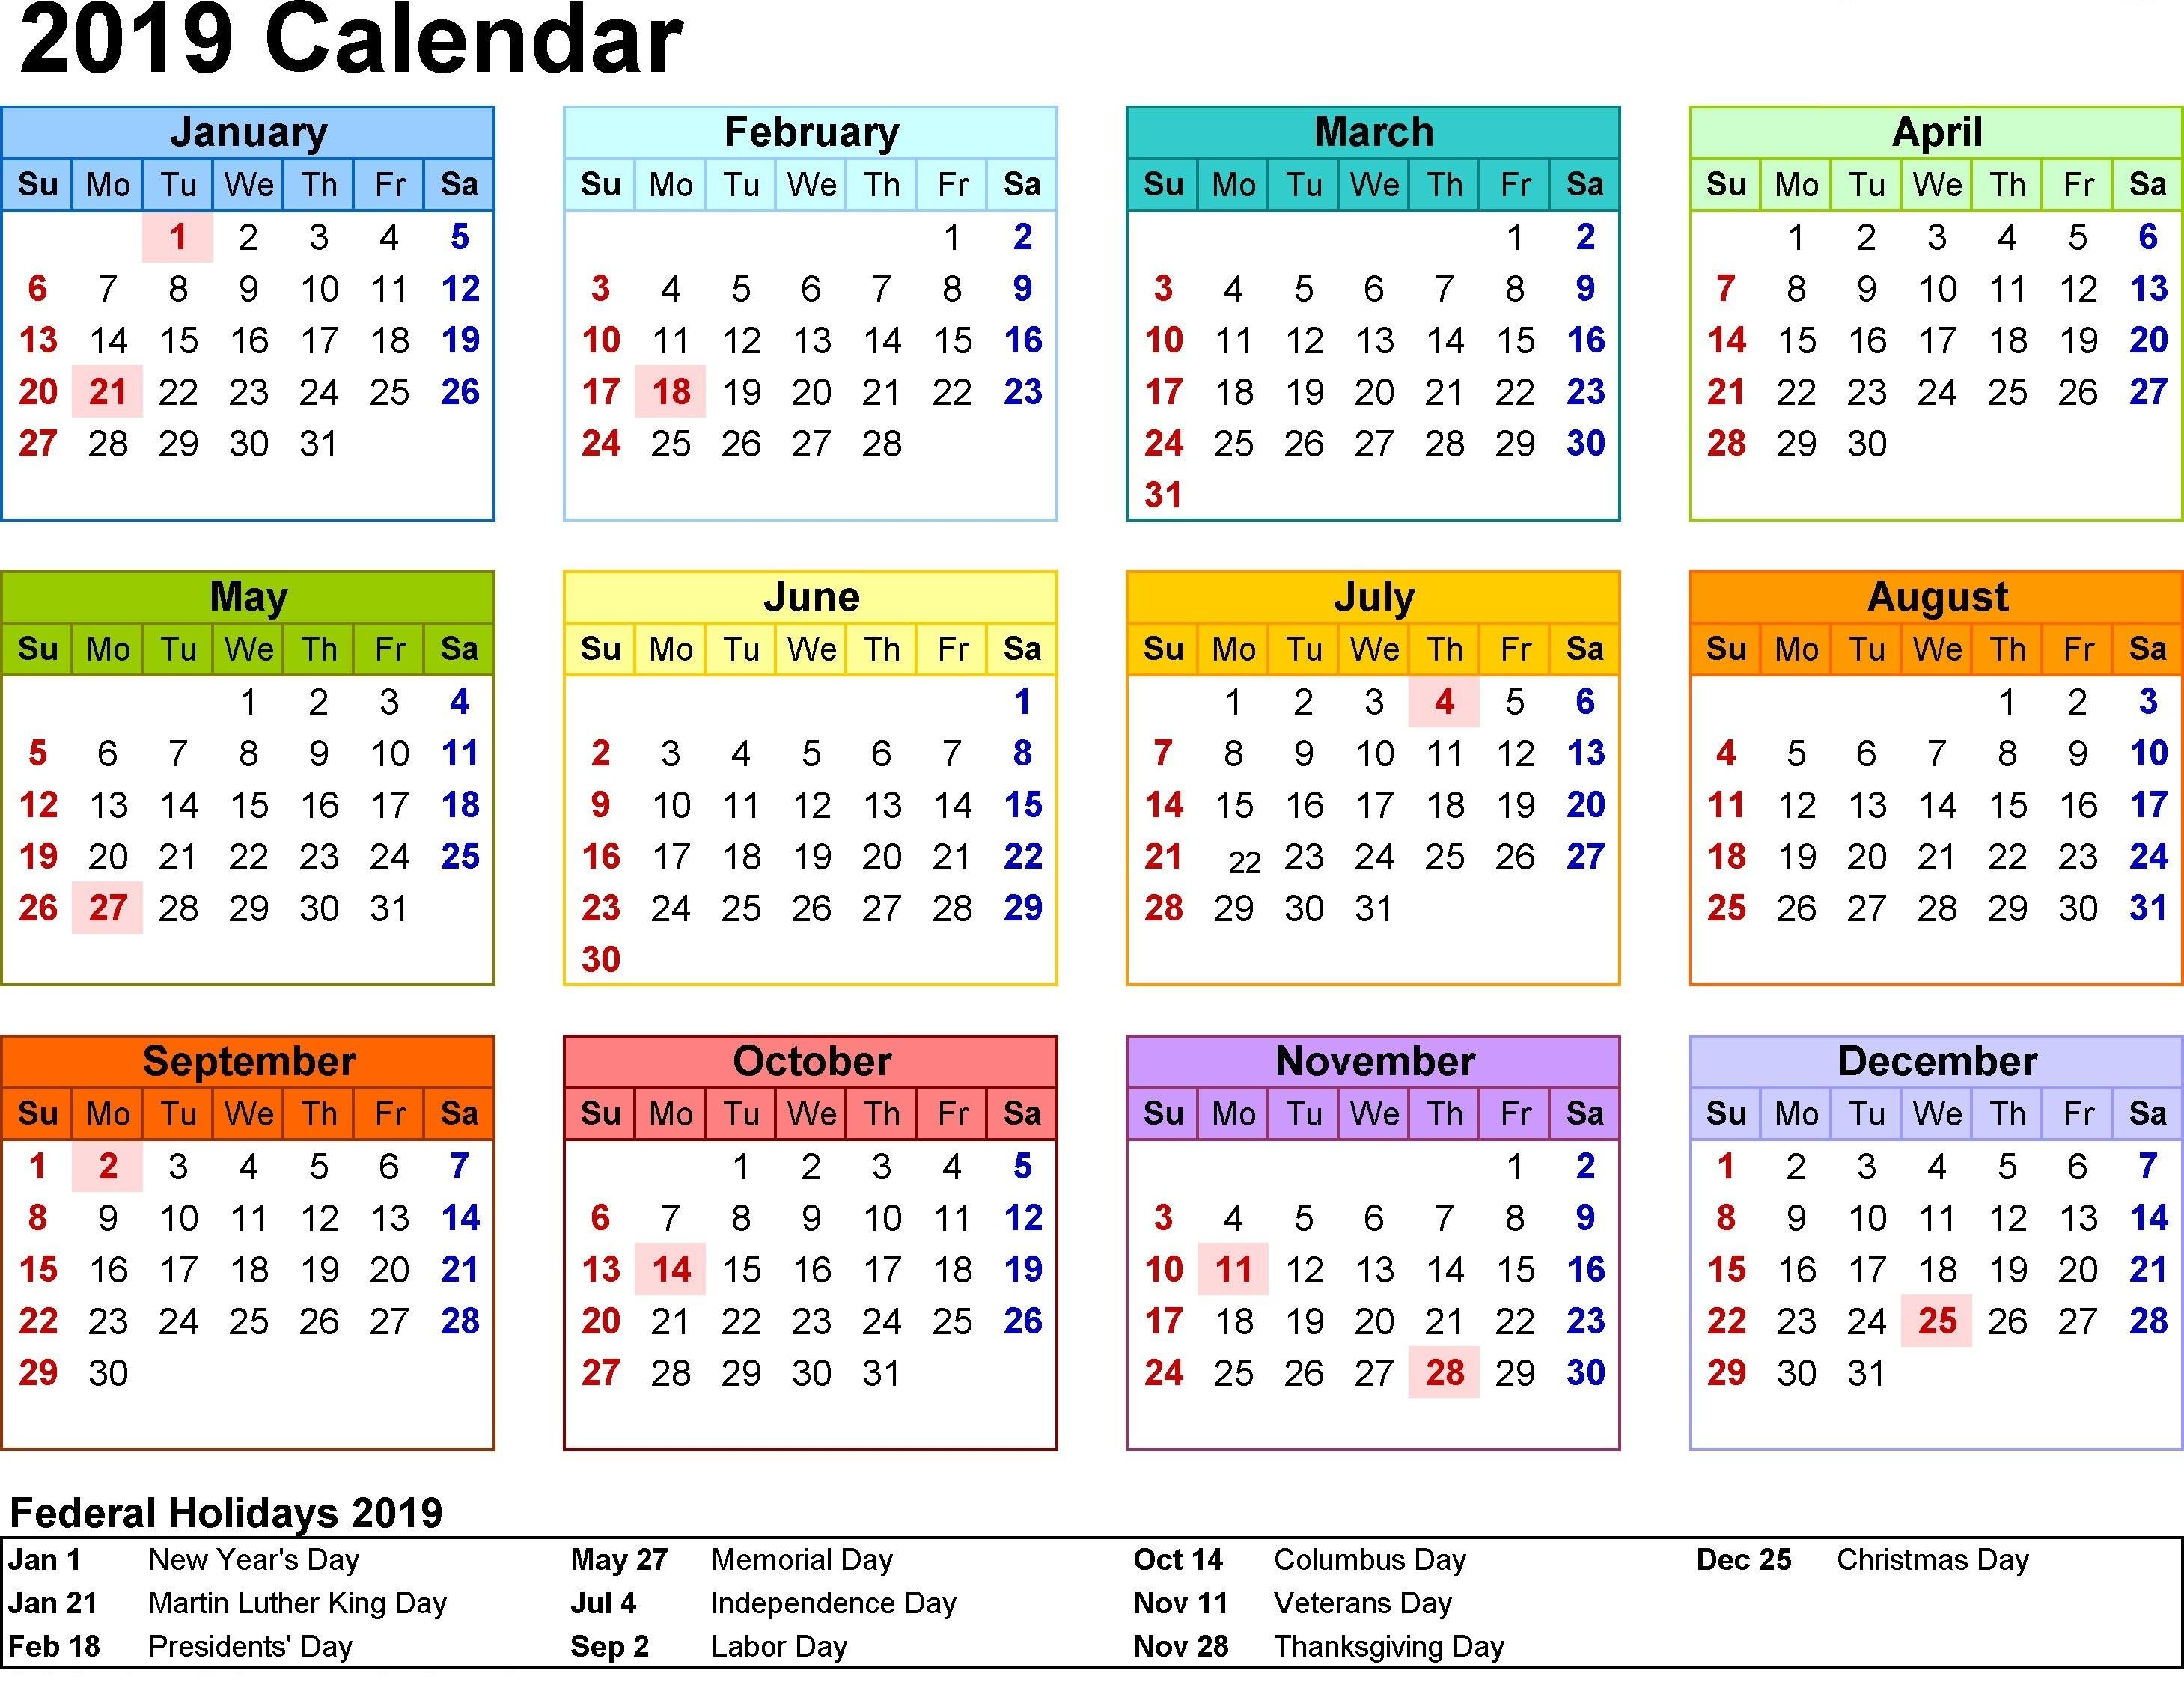 2019 Free Printable Calendars with Holidays